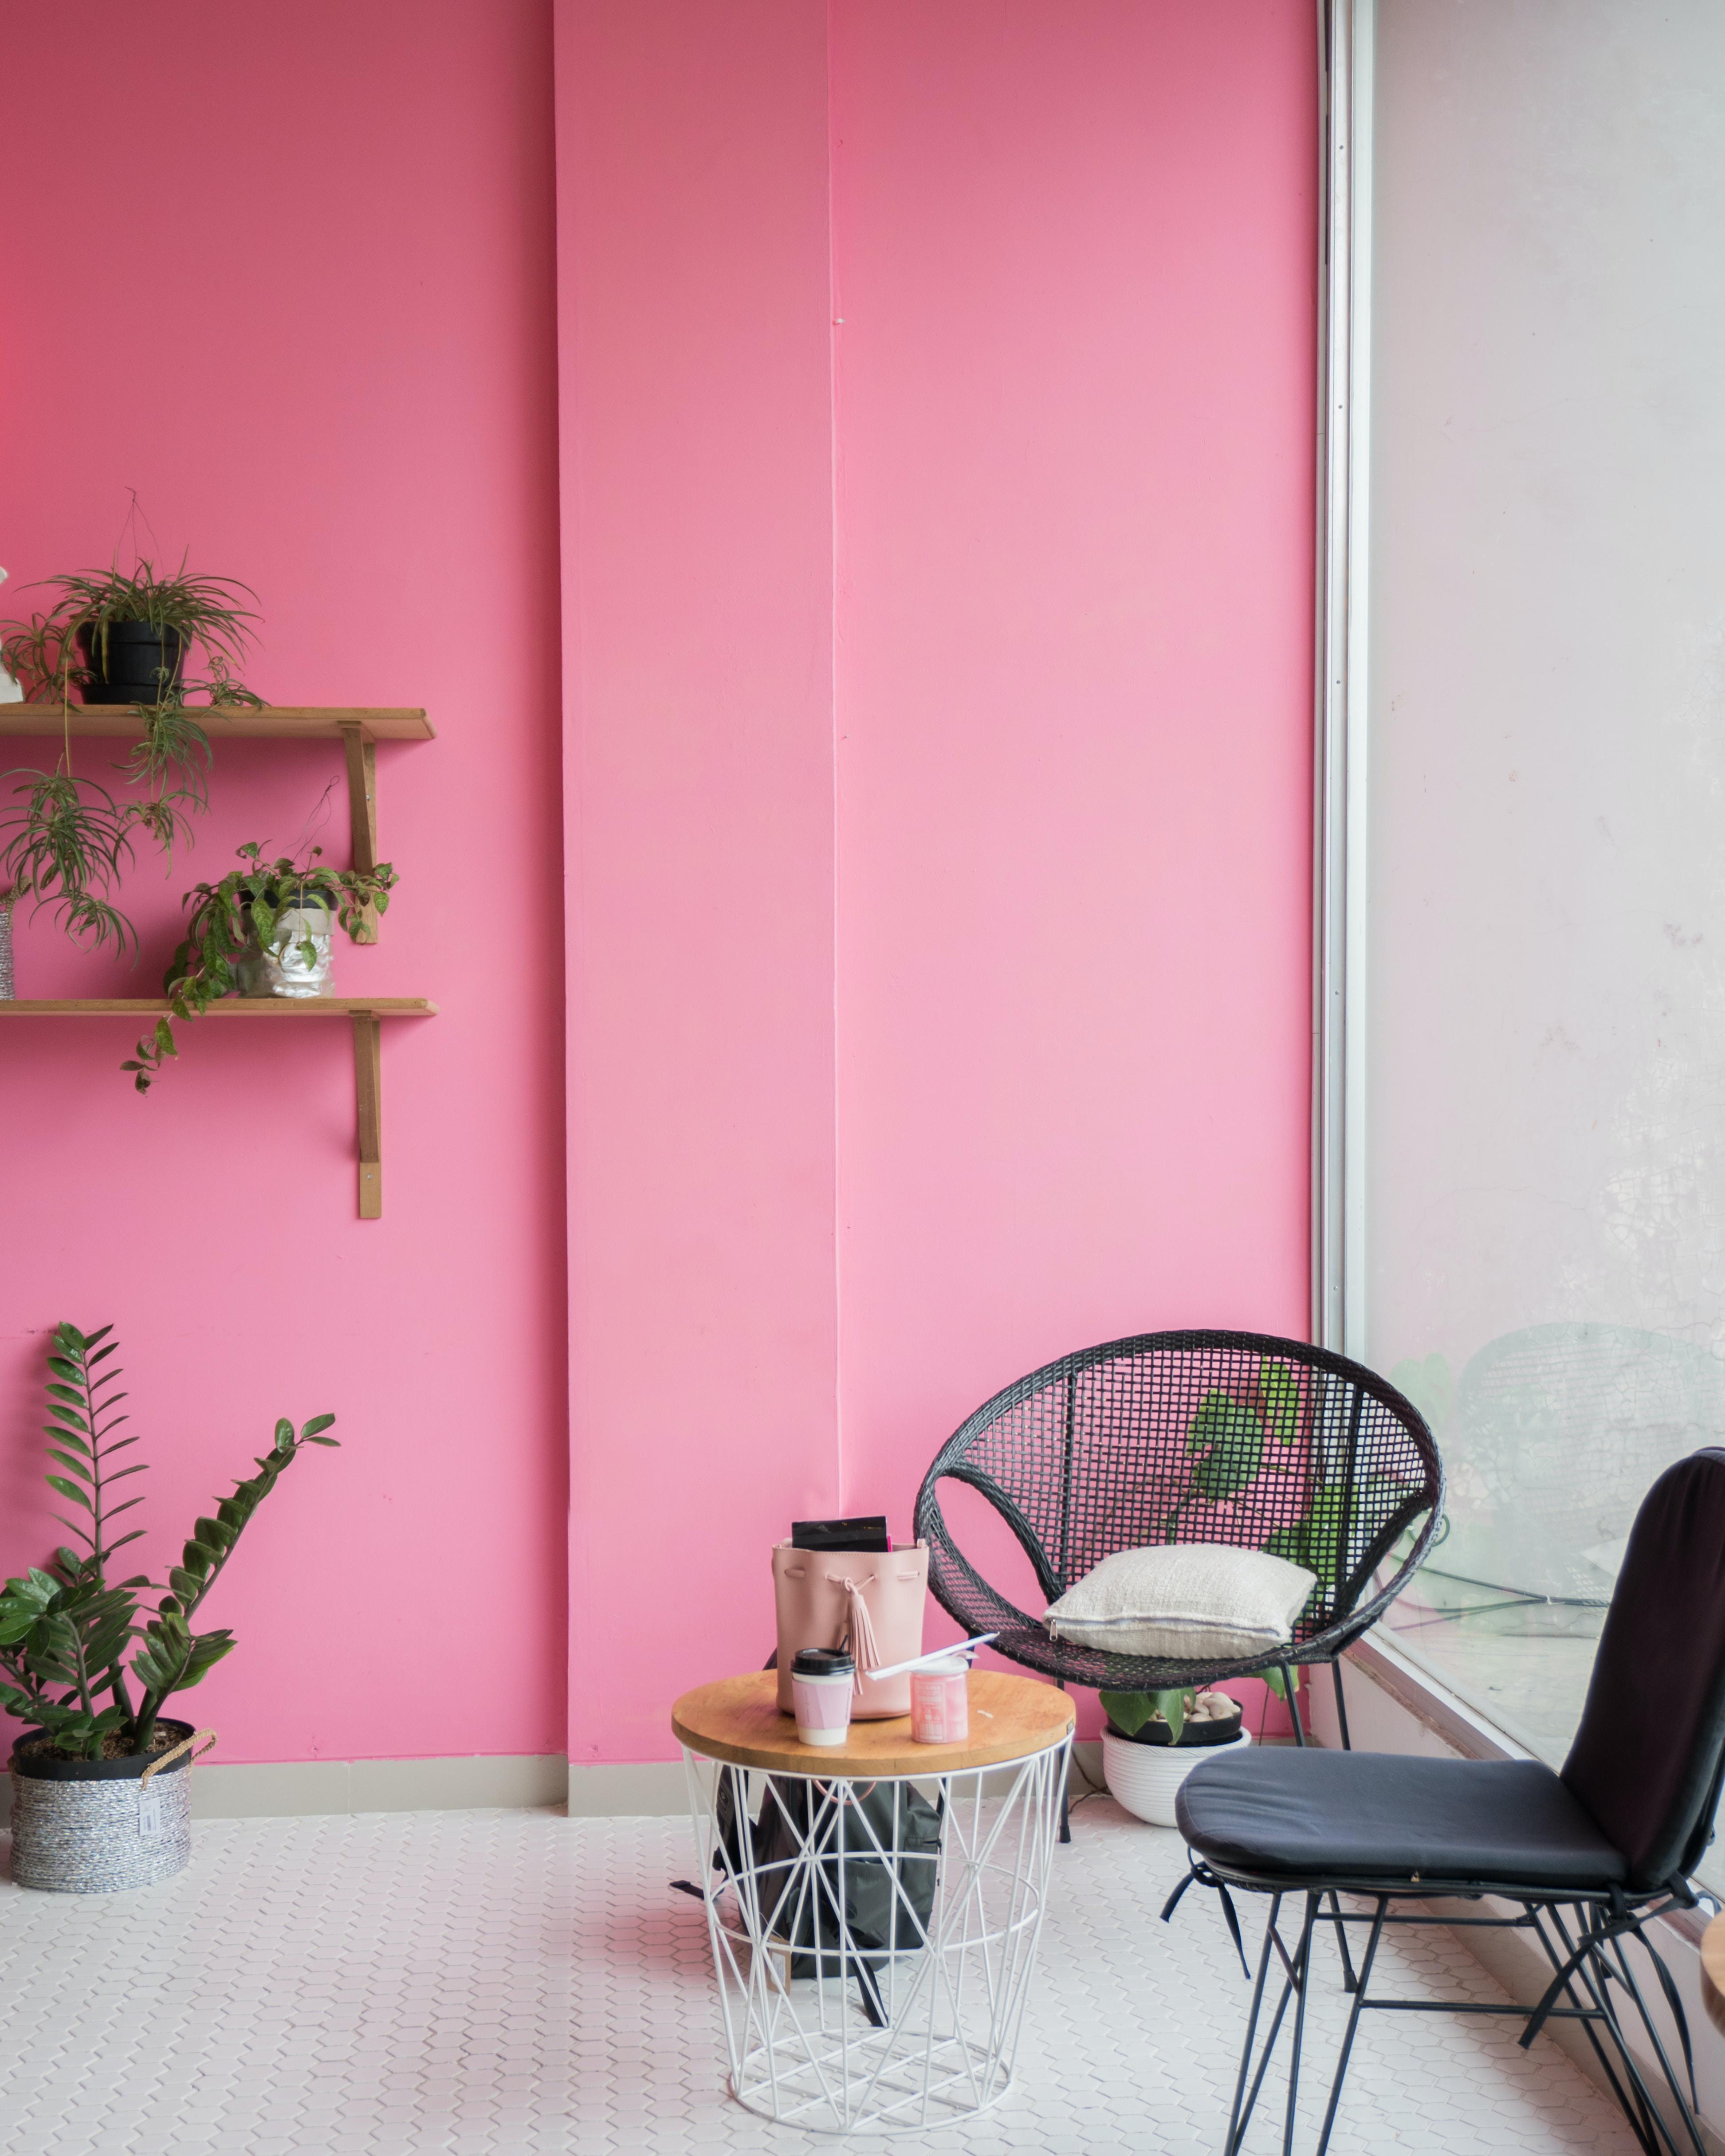 Free Interior Design Ideas For Home Decor: 20+ Best Free Interior Pictures On Unsplash